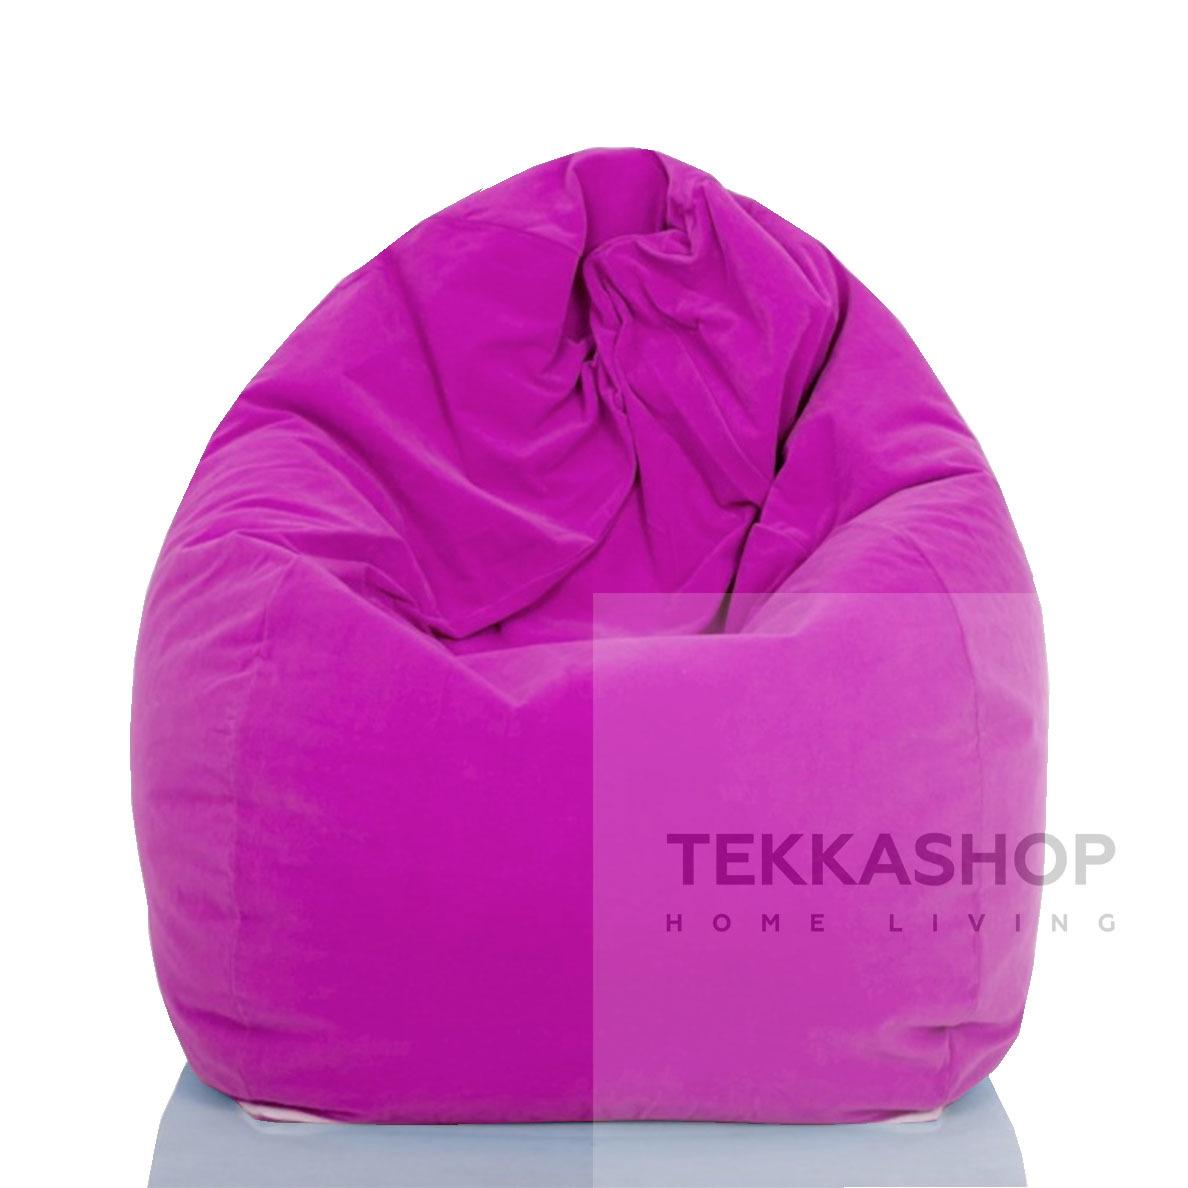 Amazing Tekkkashop Ssfbbp Living Room Colourful Fabric 3Kg Bean Bag 110Cm X 70Cm P Caraccident5 Cool Chair Designs And Ideas Caraccident5Info